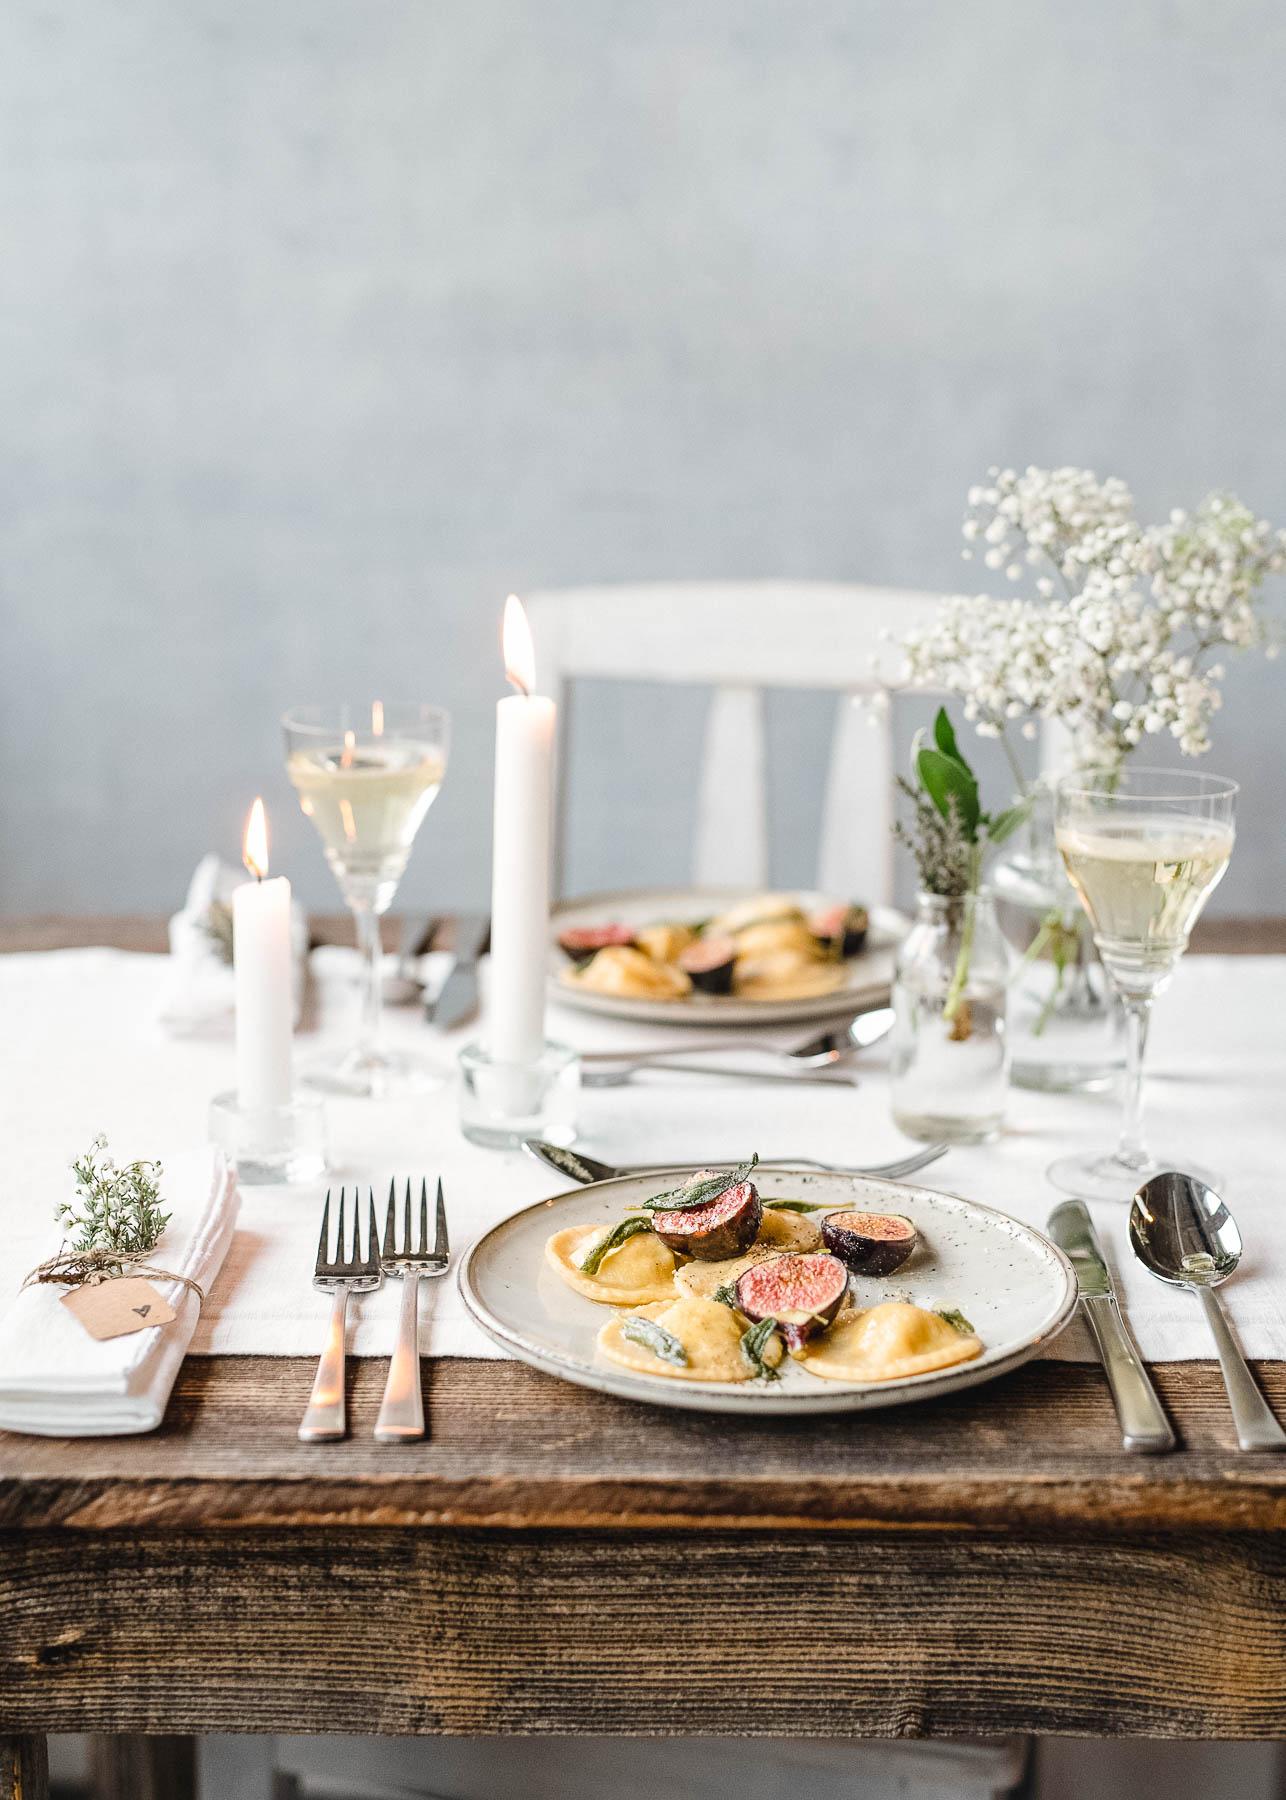 Foodfotografie Feride Dogum & Elfi Rasser